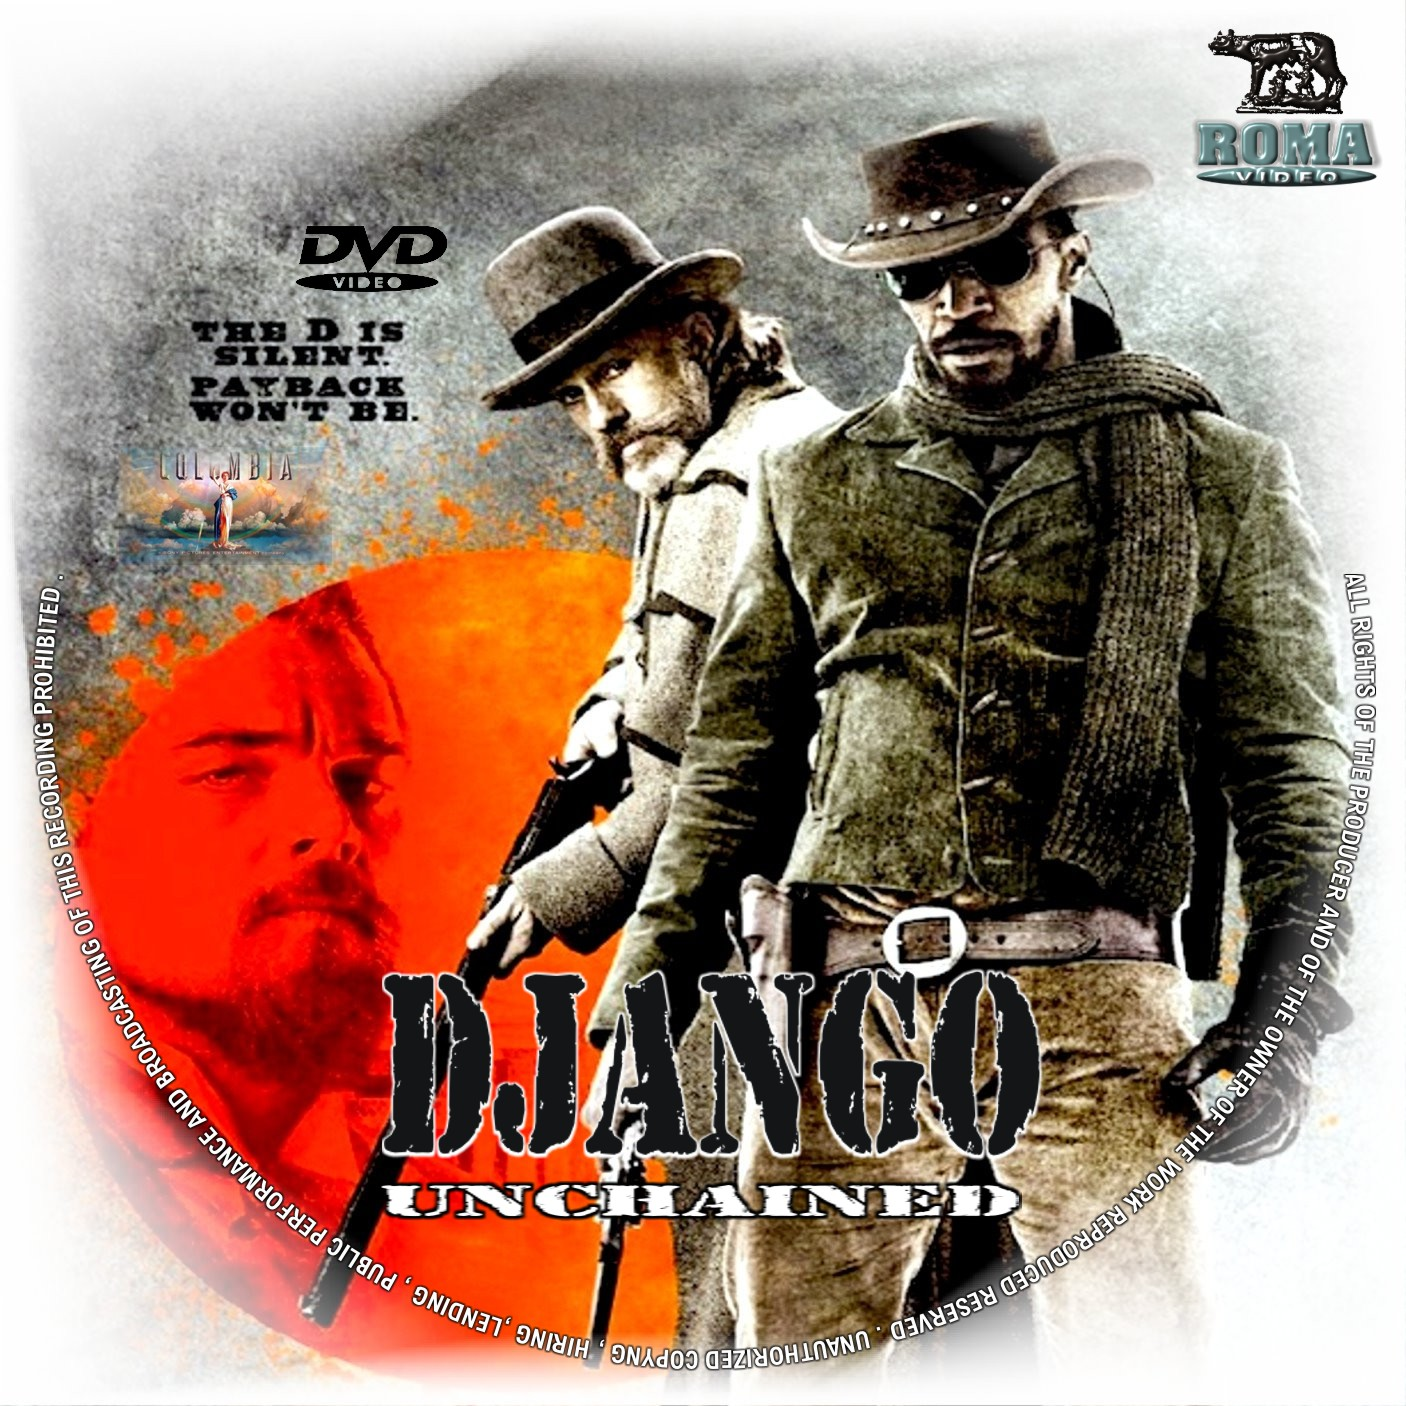 django unchained 2012 film analysis postmodernism Staff, student perspectives in the school of english, university college cork, ireland.